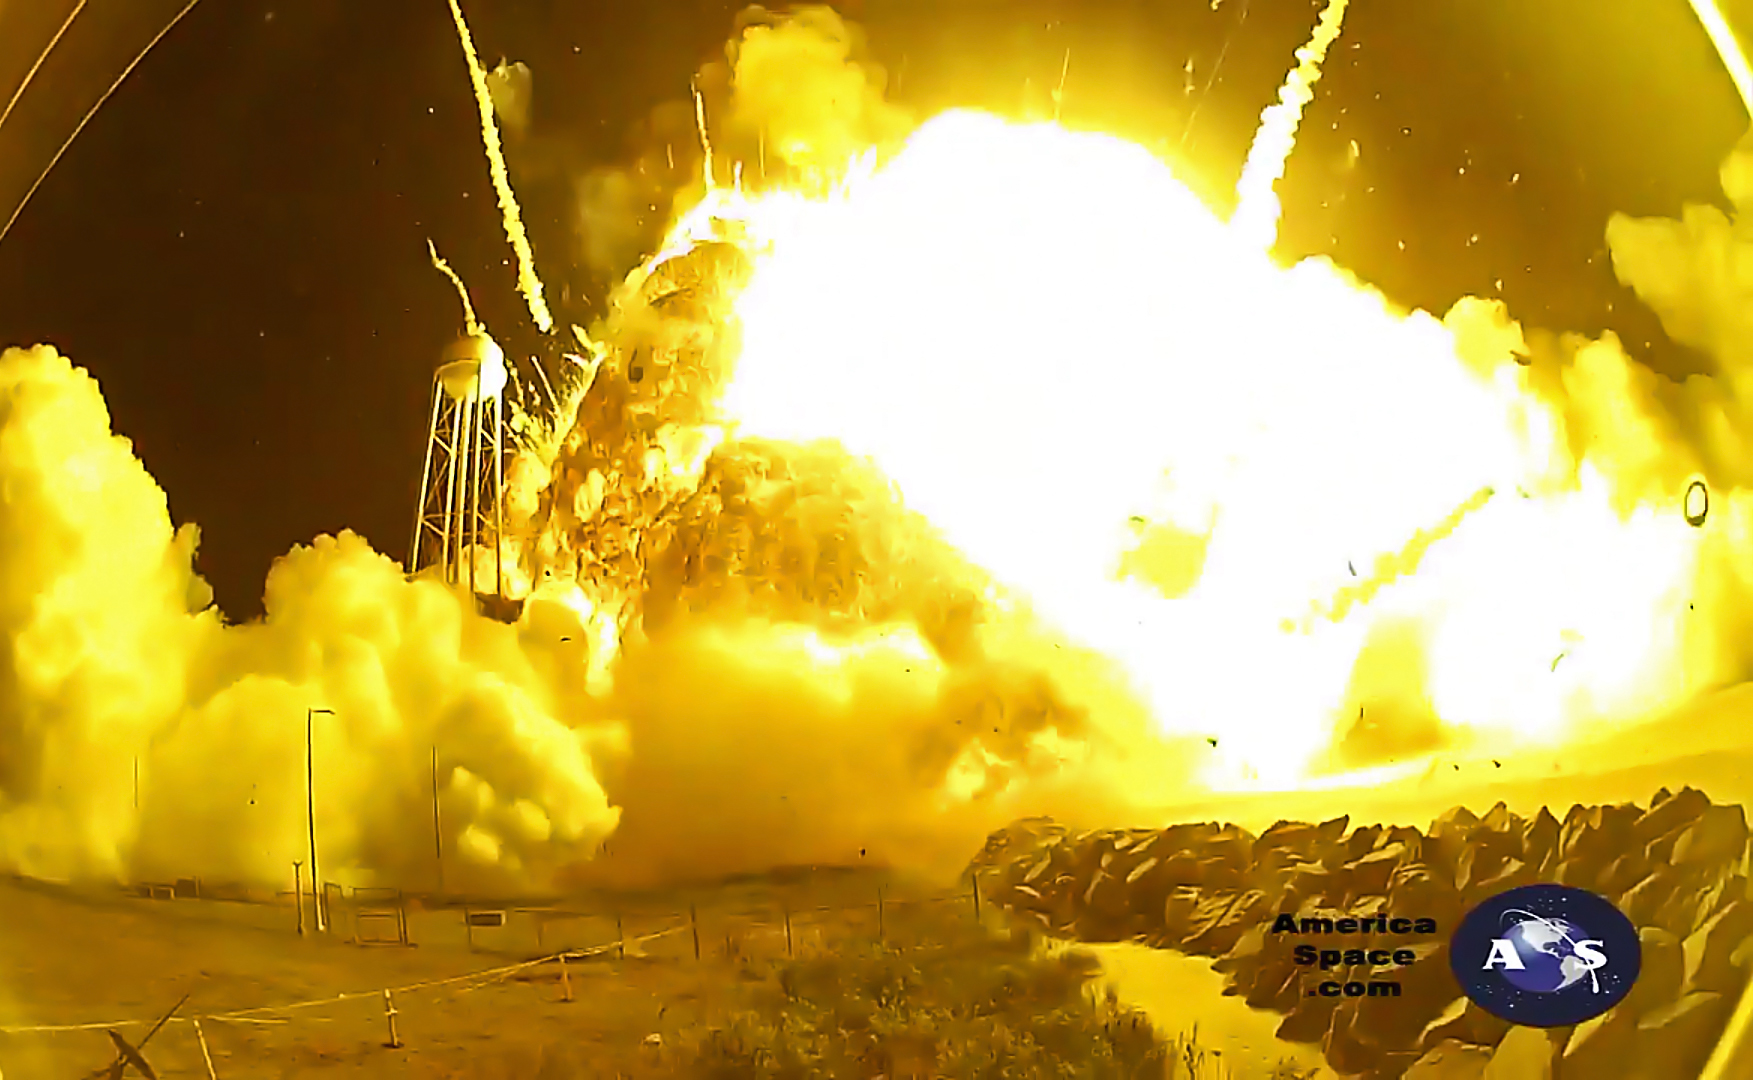 Antares Rocket Explosion Video